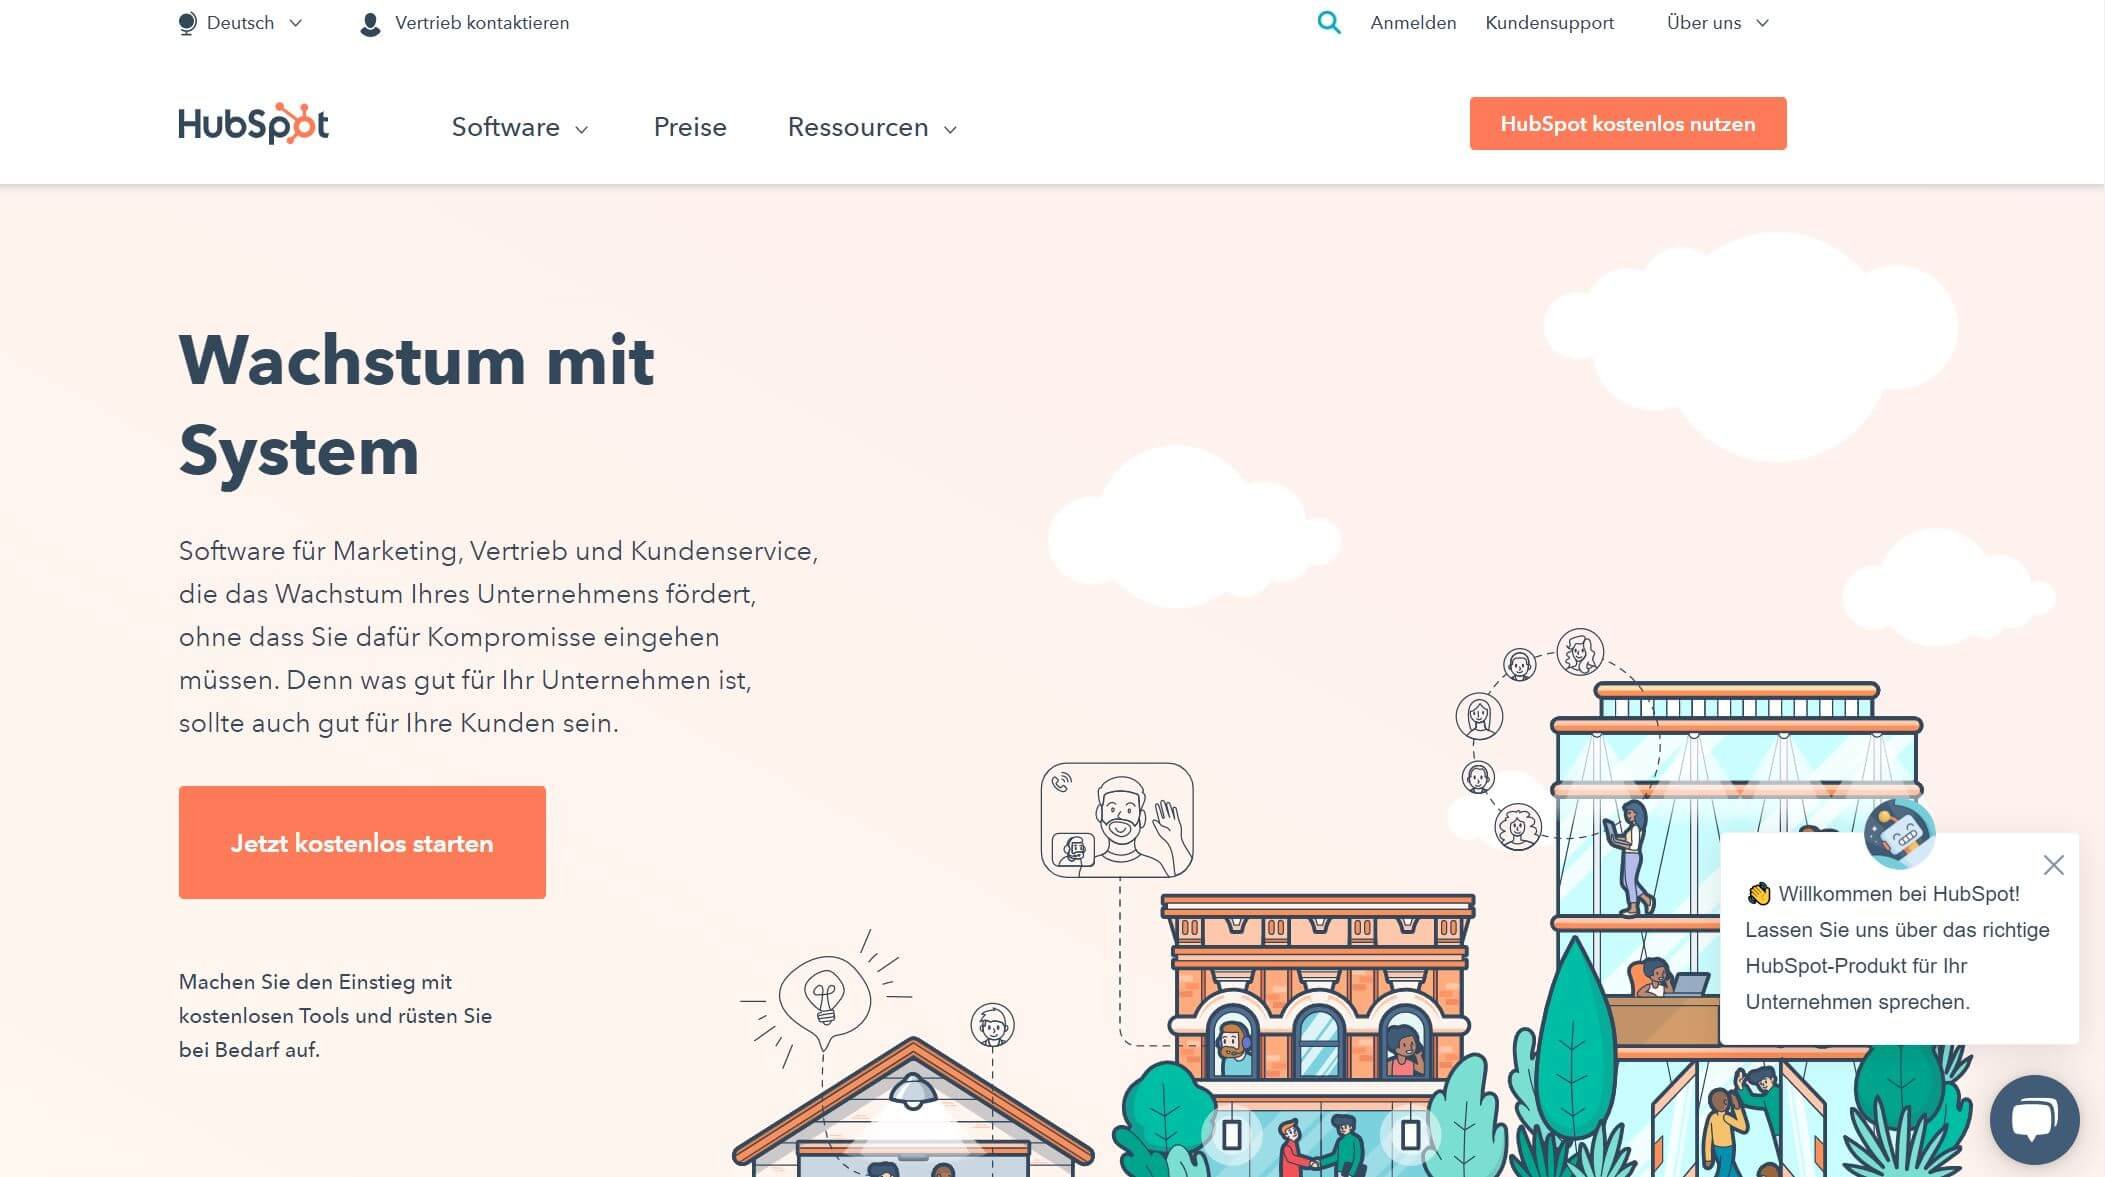 HubSpot Startseite